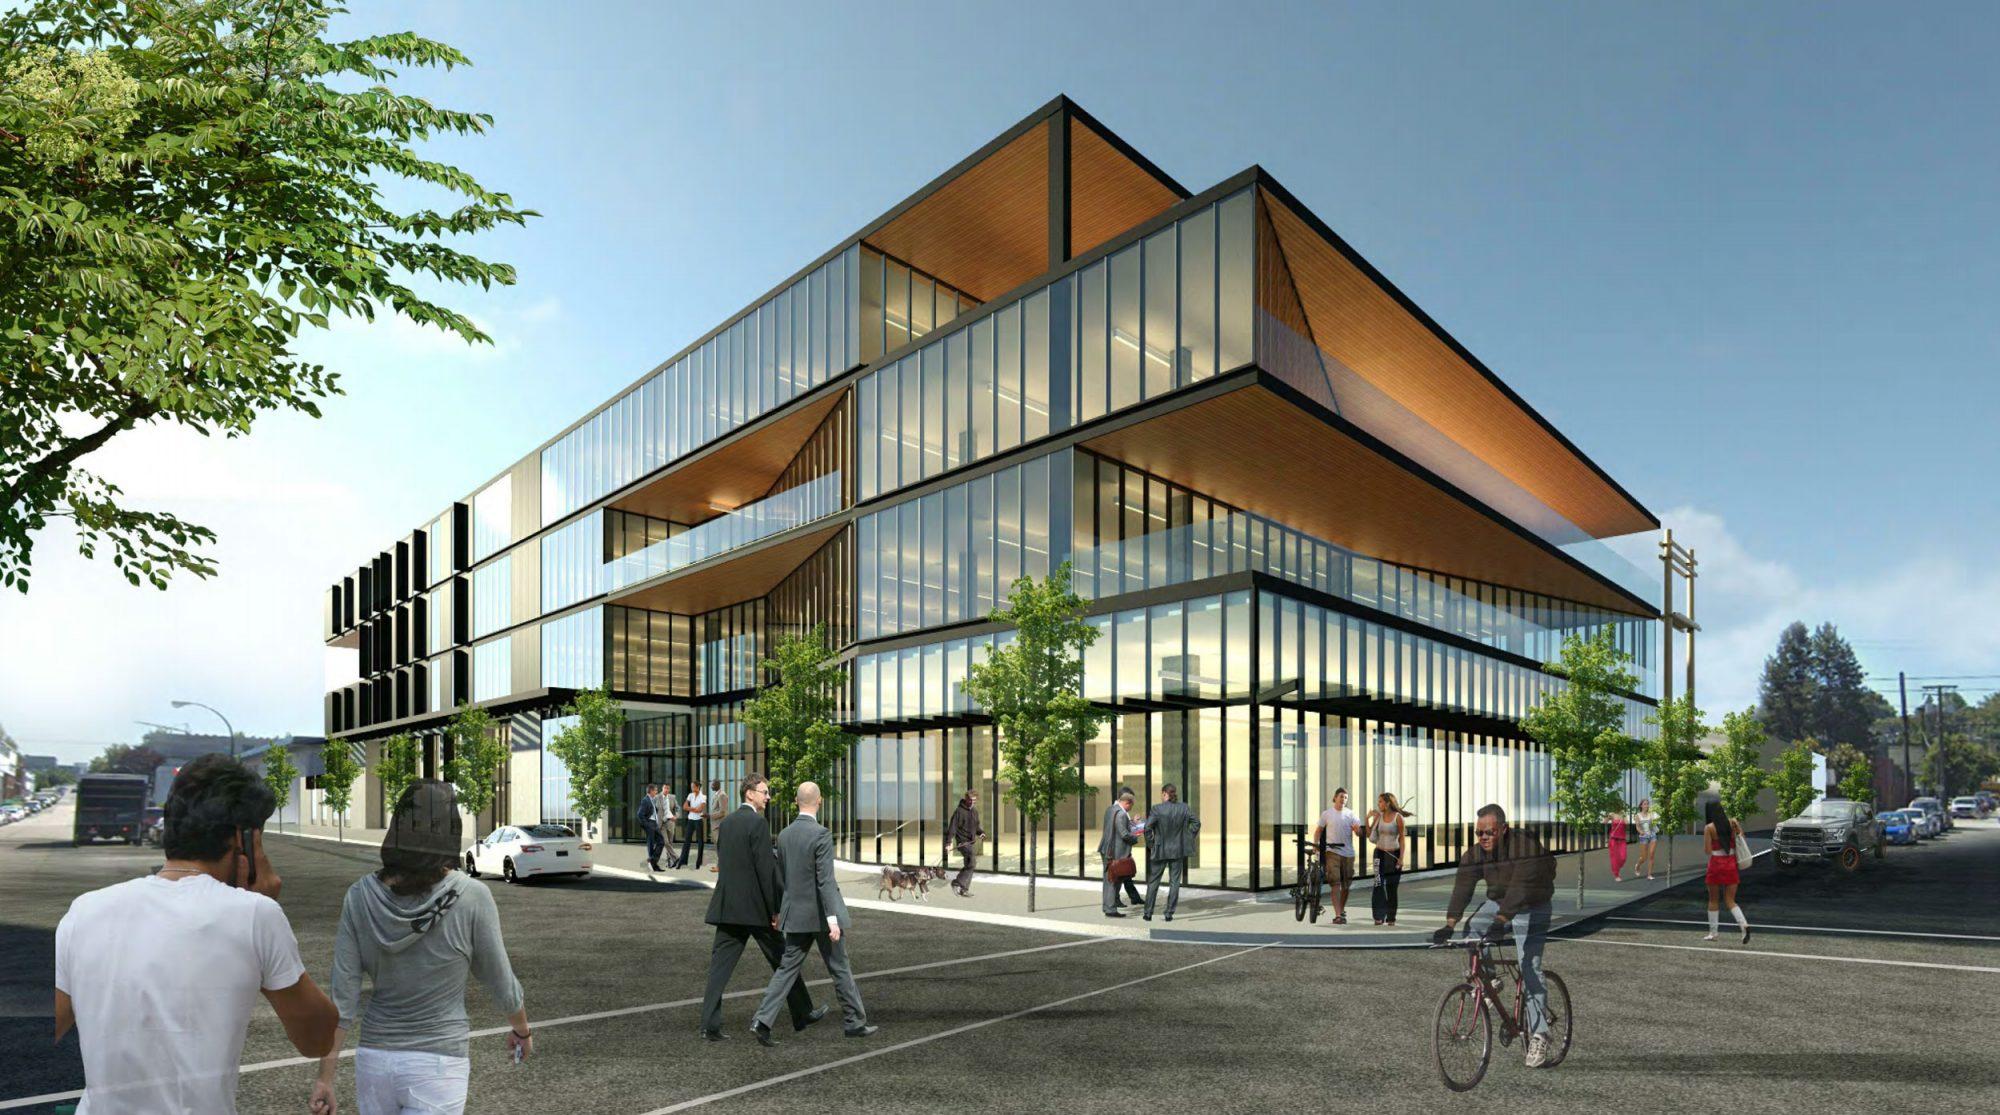 Mount Pleasant light industrial building raises bar on design